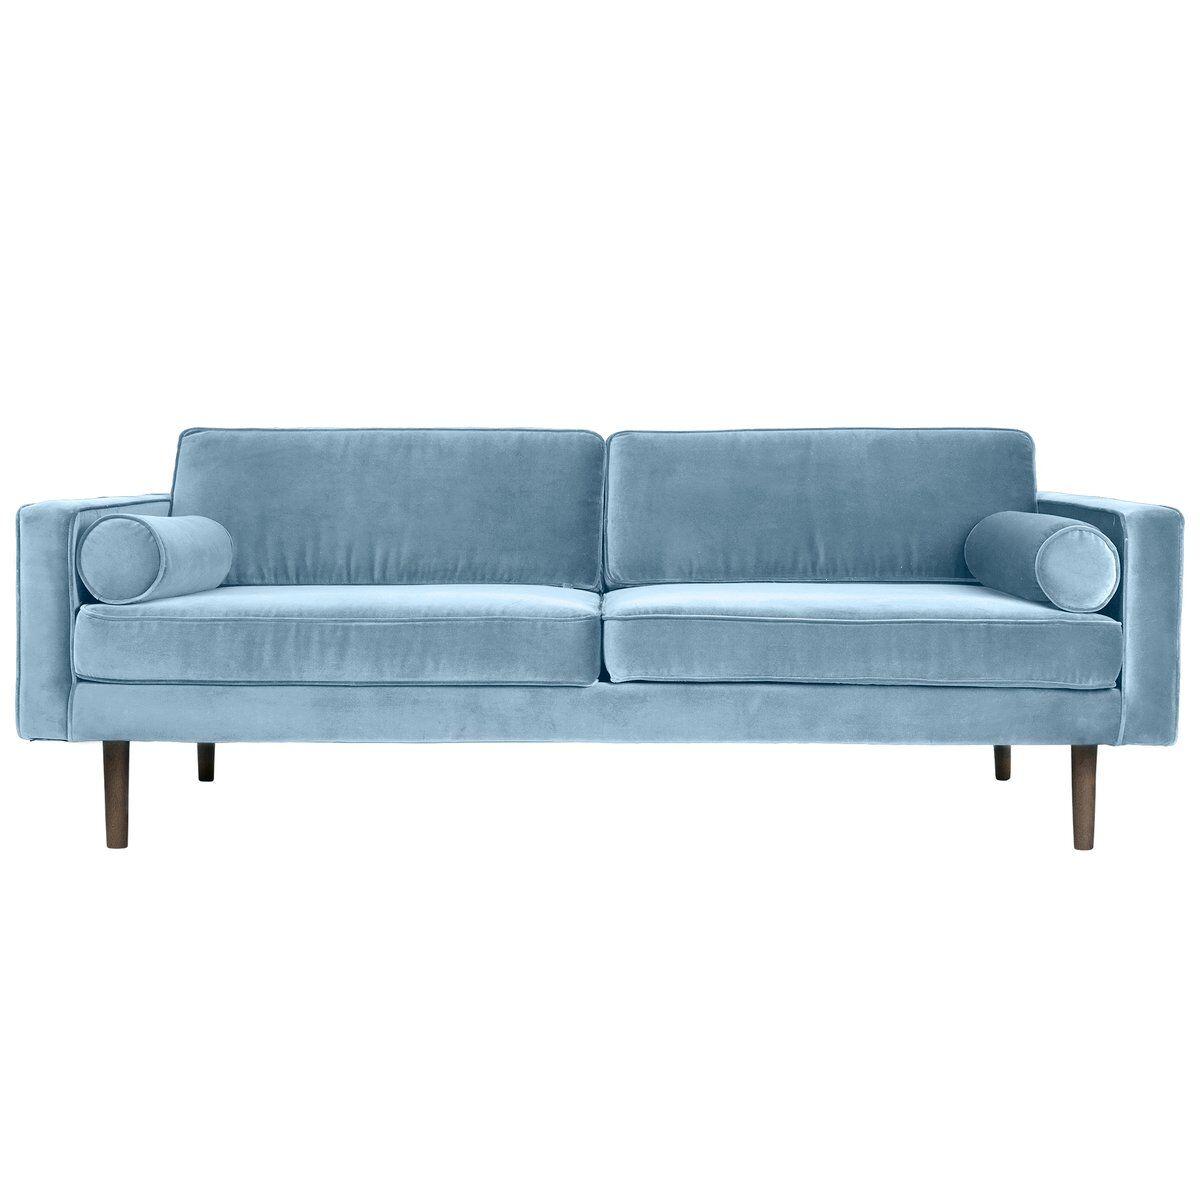 Broste Copenhagen Wind 3-seter sofa Pastel blue (blå)